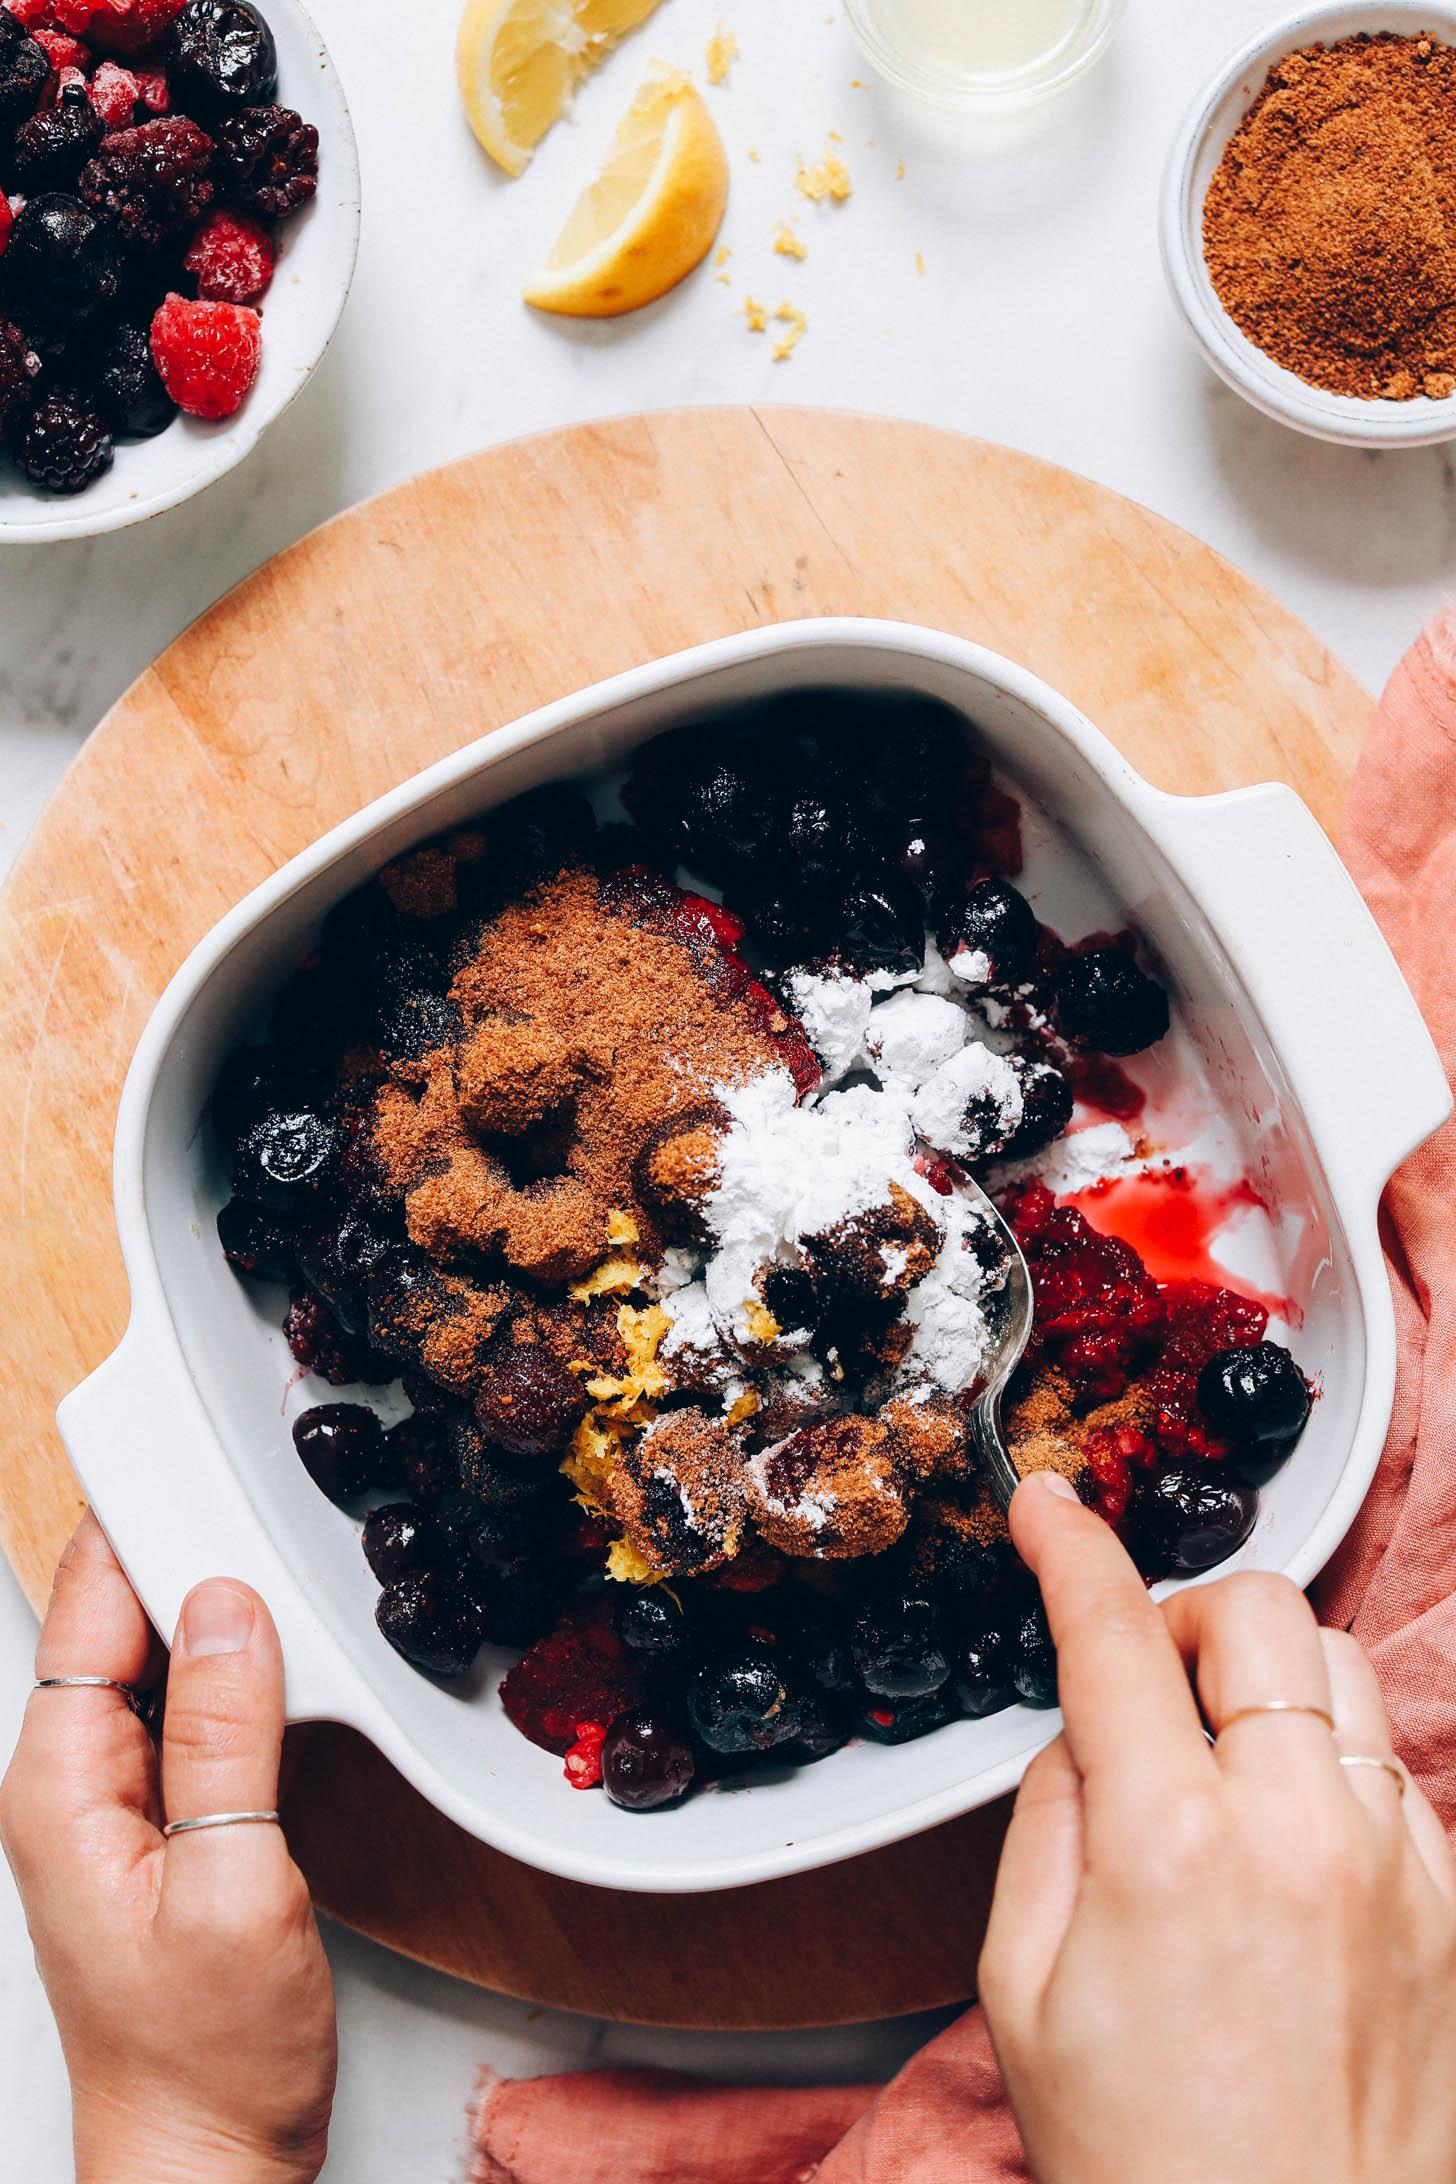 Stirring frozen berries, coconut sugar, arrowroot powder, and lemon zest